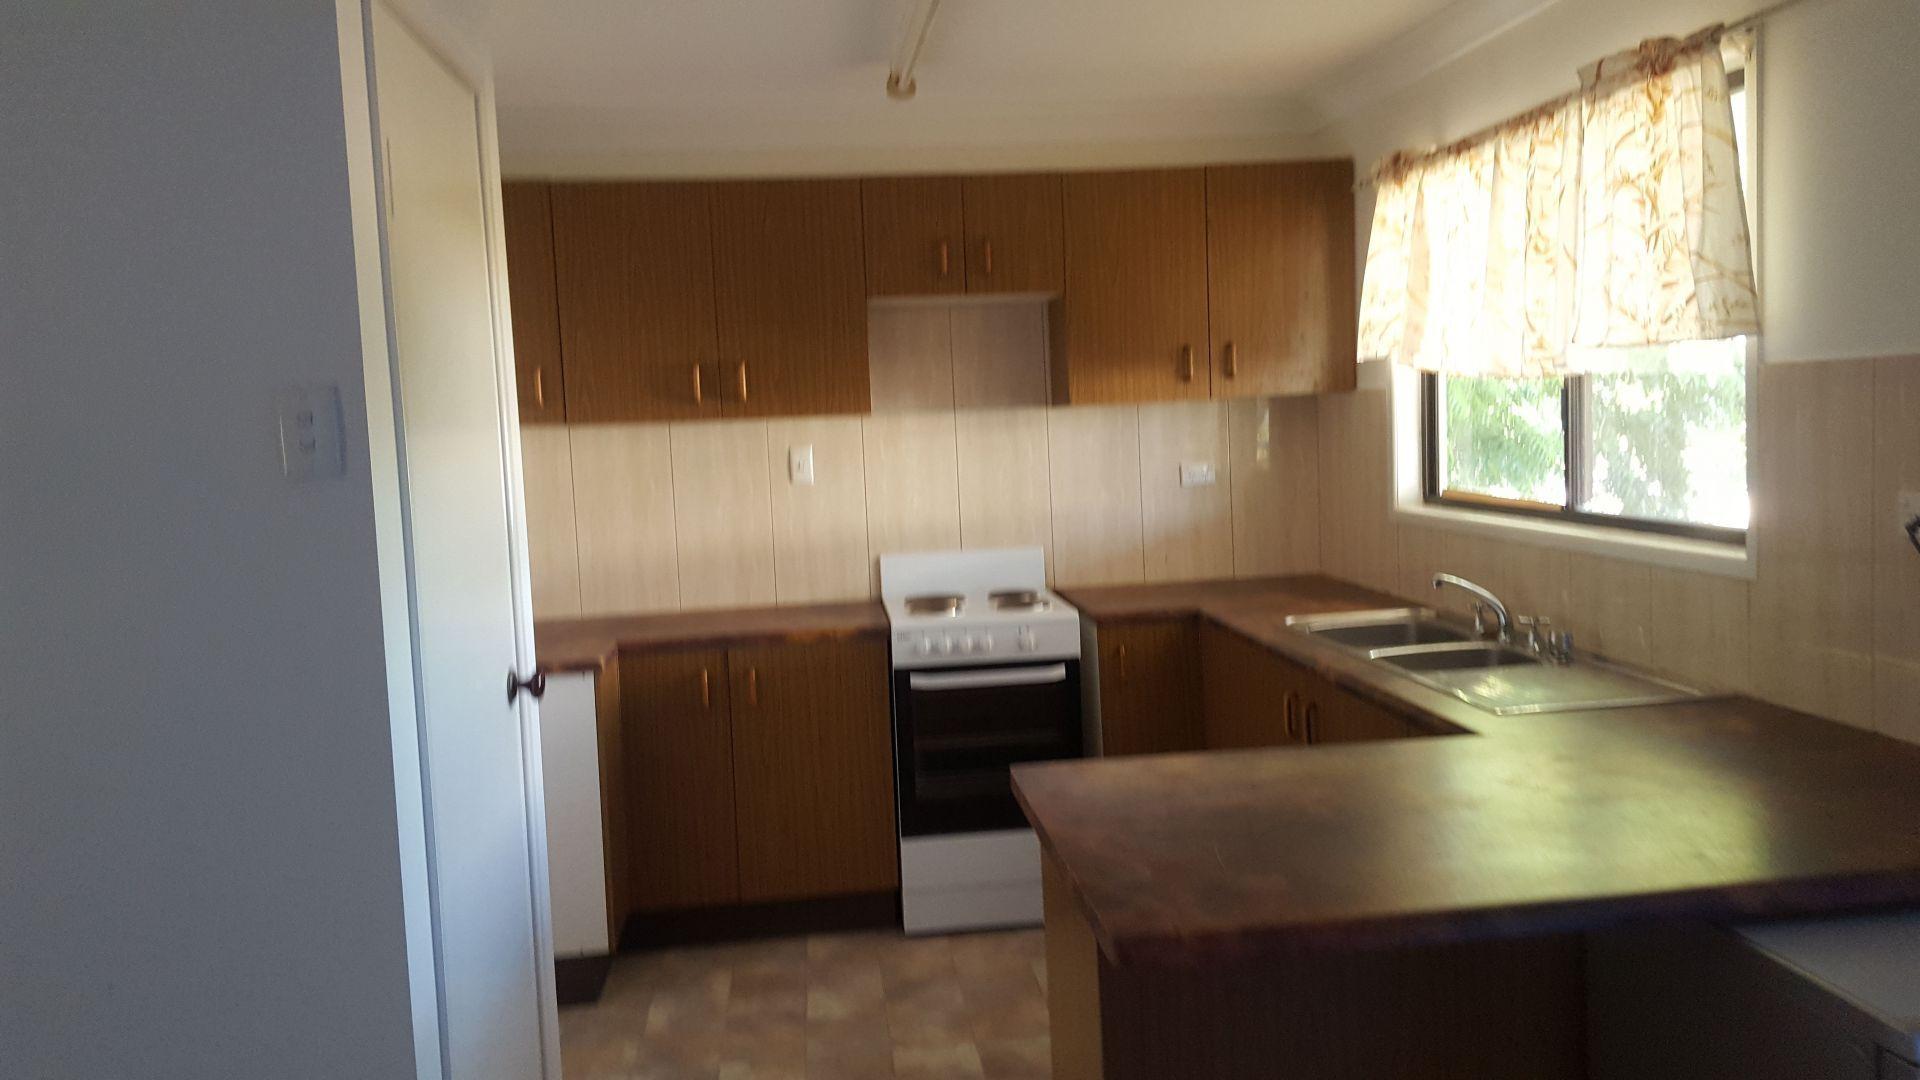 57 Mckinlay St, Cloncurry QLD 4824, Image 1